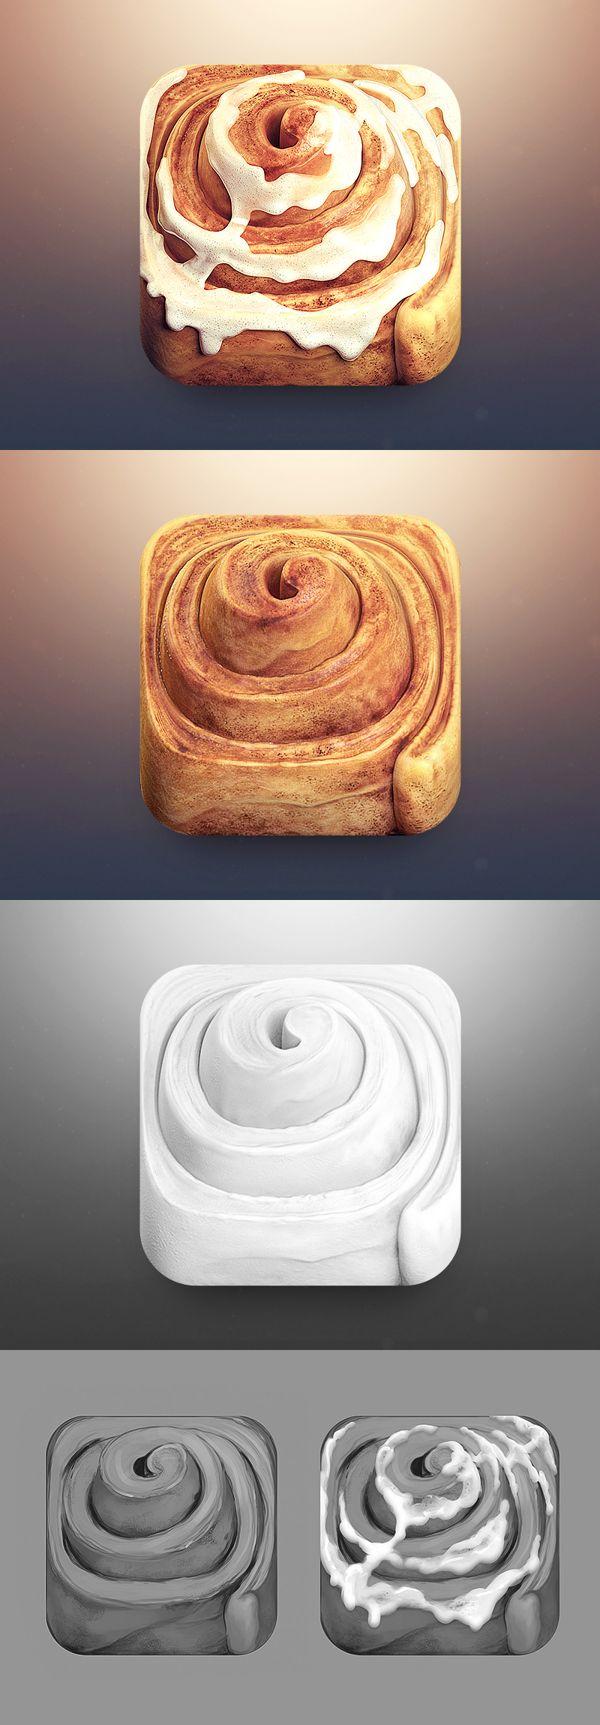 Cinnamon Roll App Icon by CreativeDash , via Behance